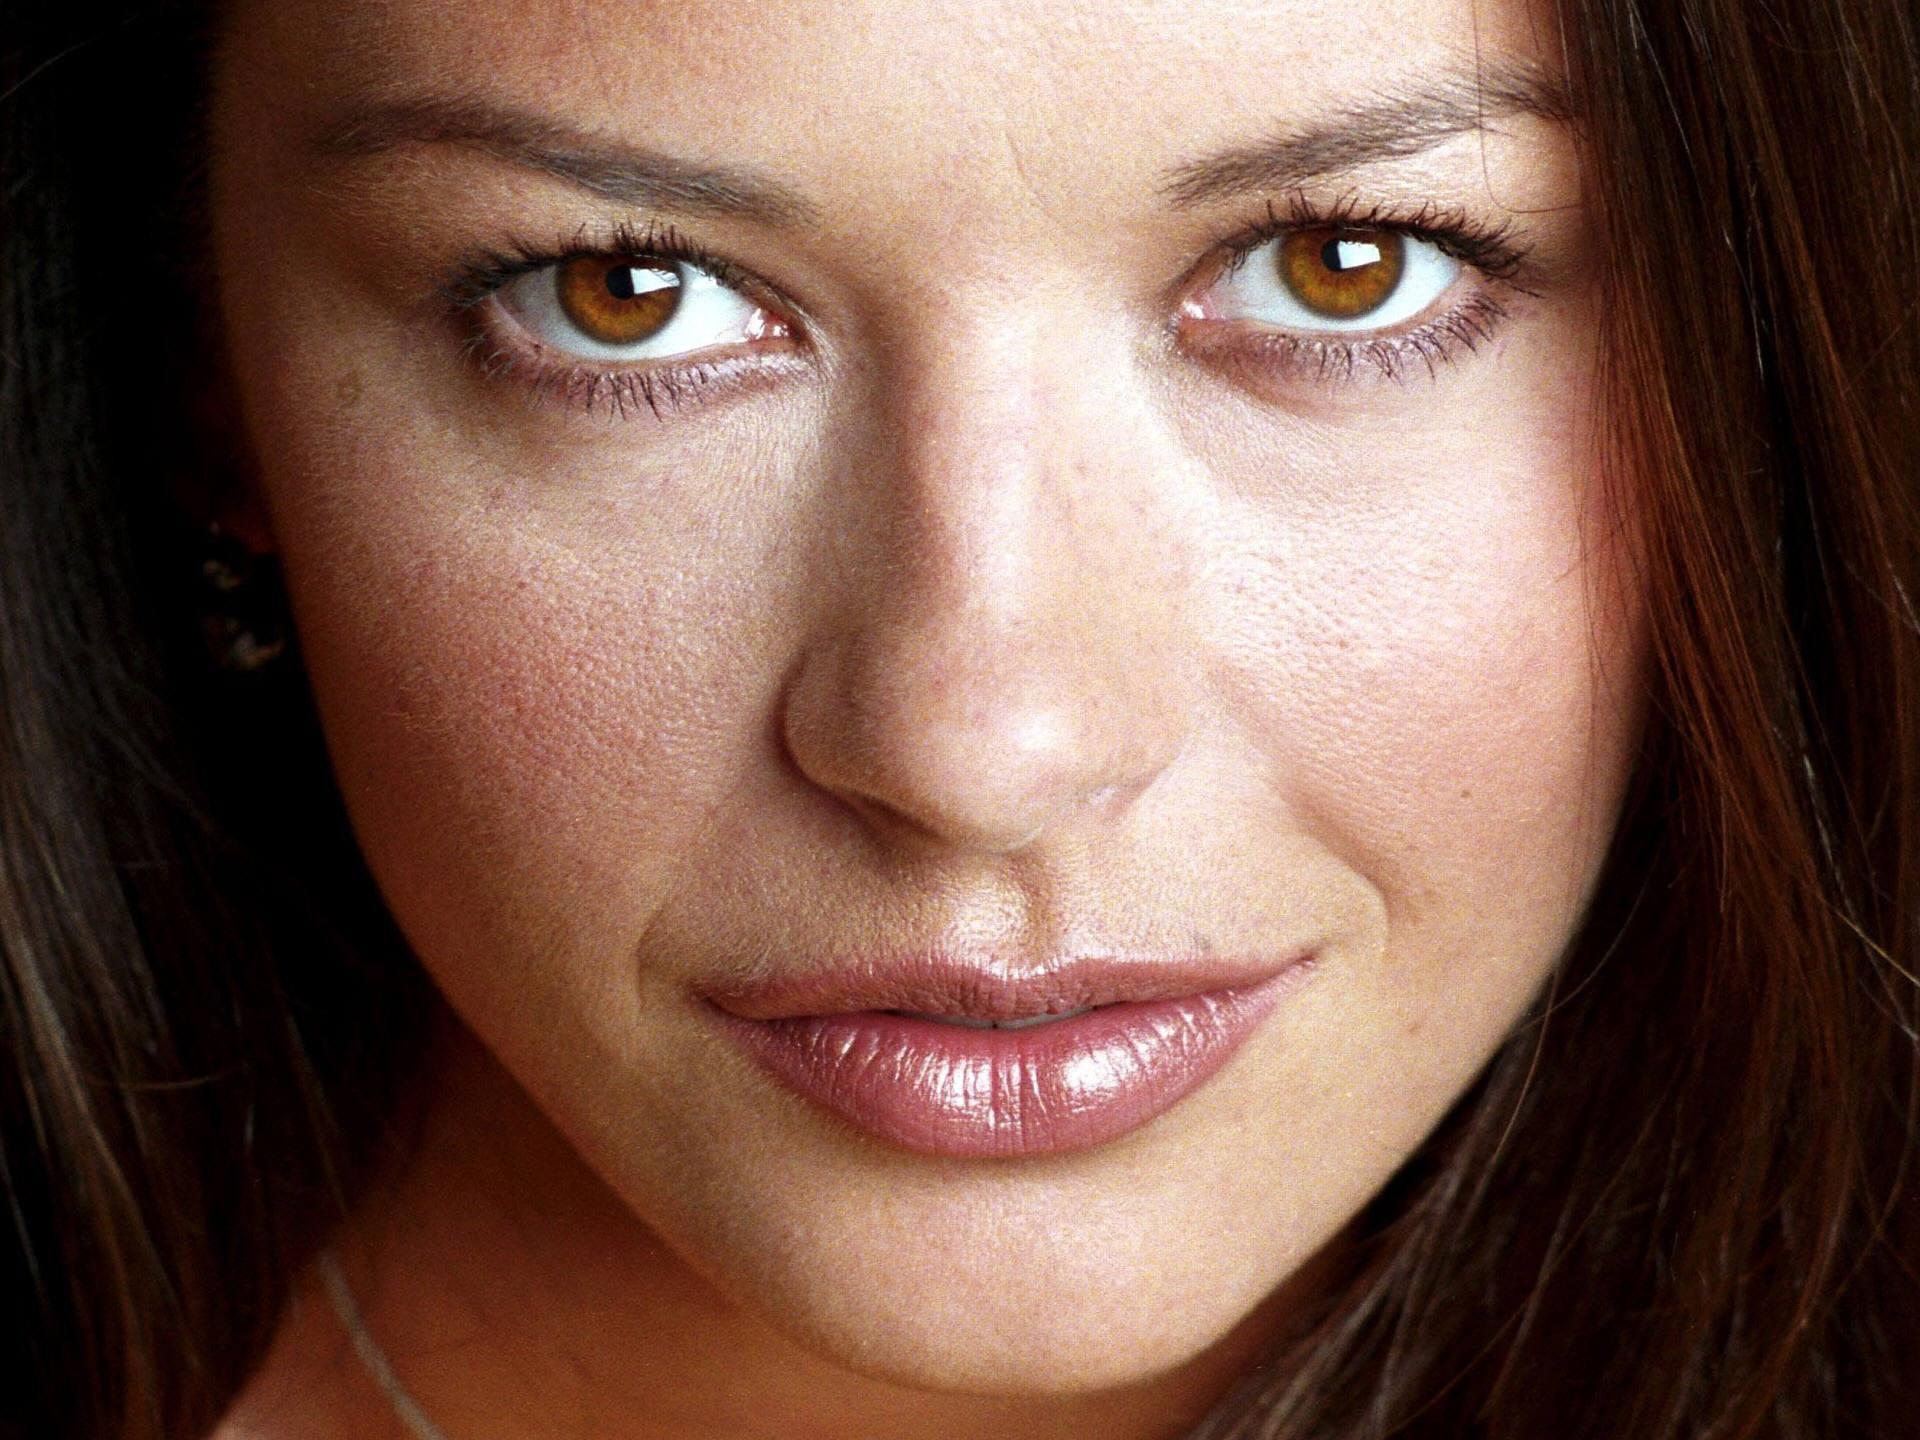 Кэтрин Зета-Джонс красивые фото Catherine Zeta-Jones beautiful photos